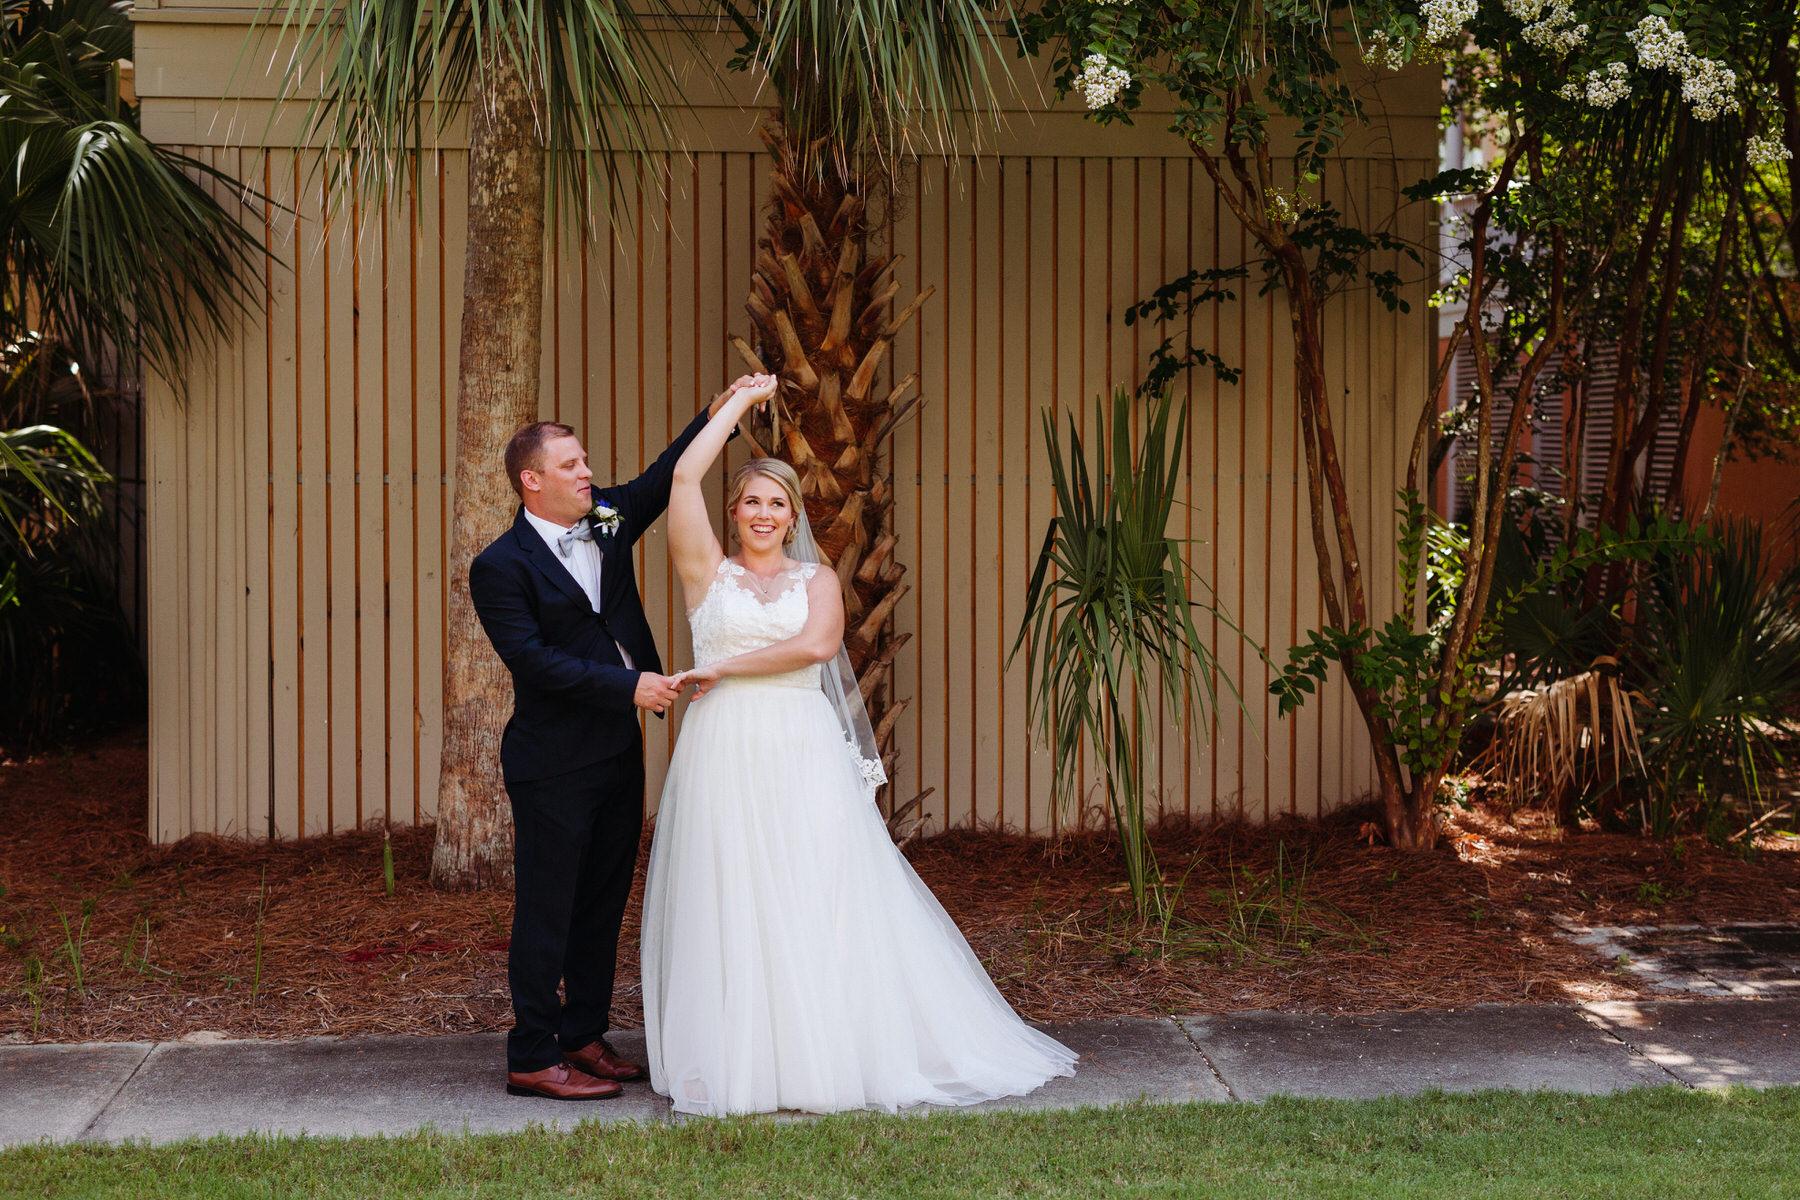 wild-dunes-charleston-isle-of-palms-IOP-wedding-776.JPG